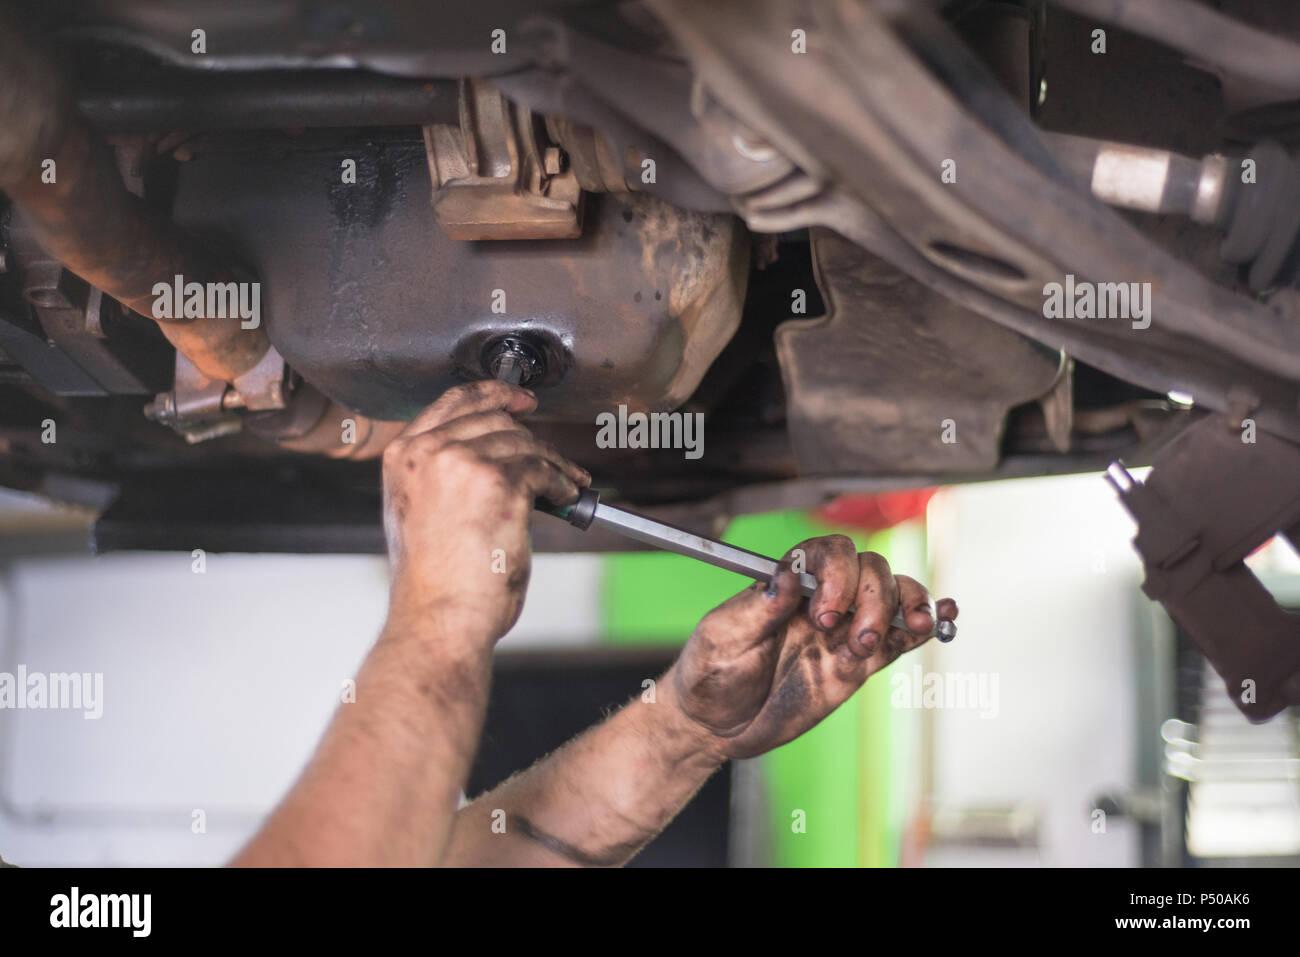 Car mechanic removing used engine oil - Stock Image